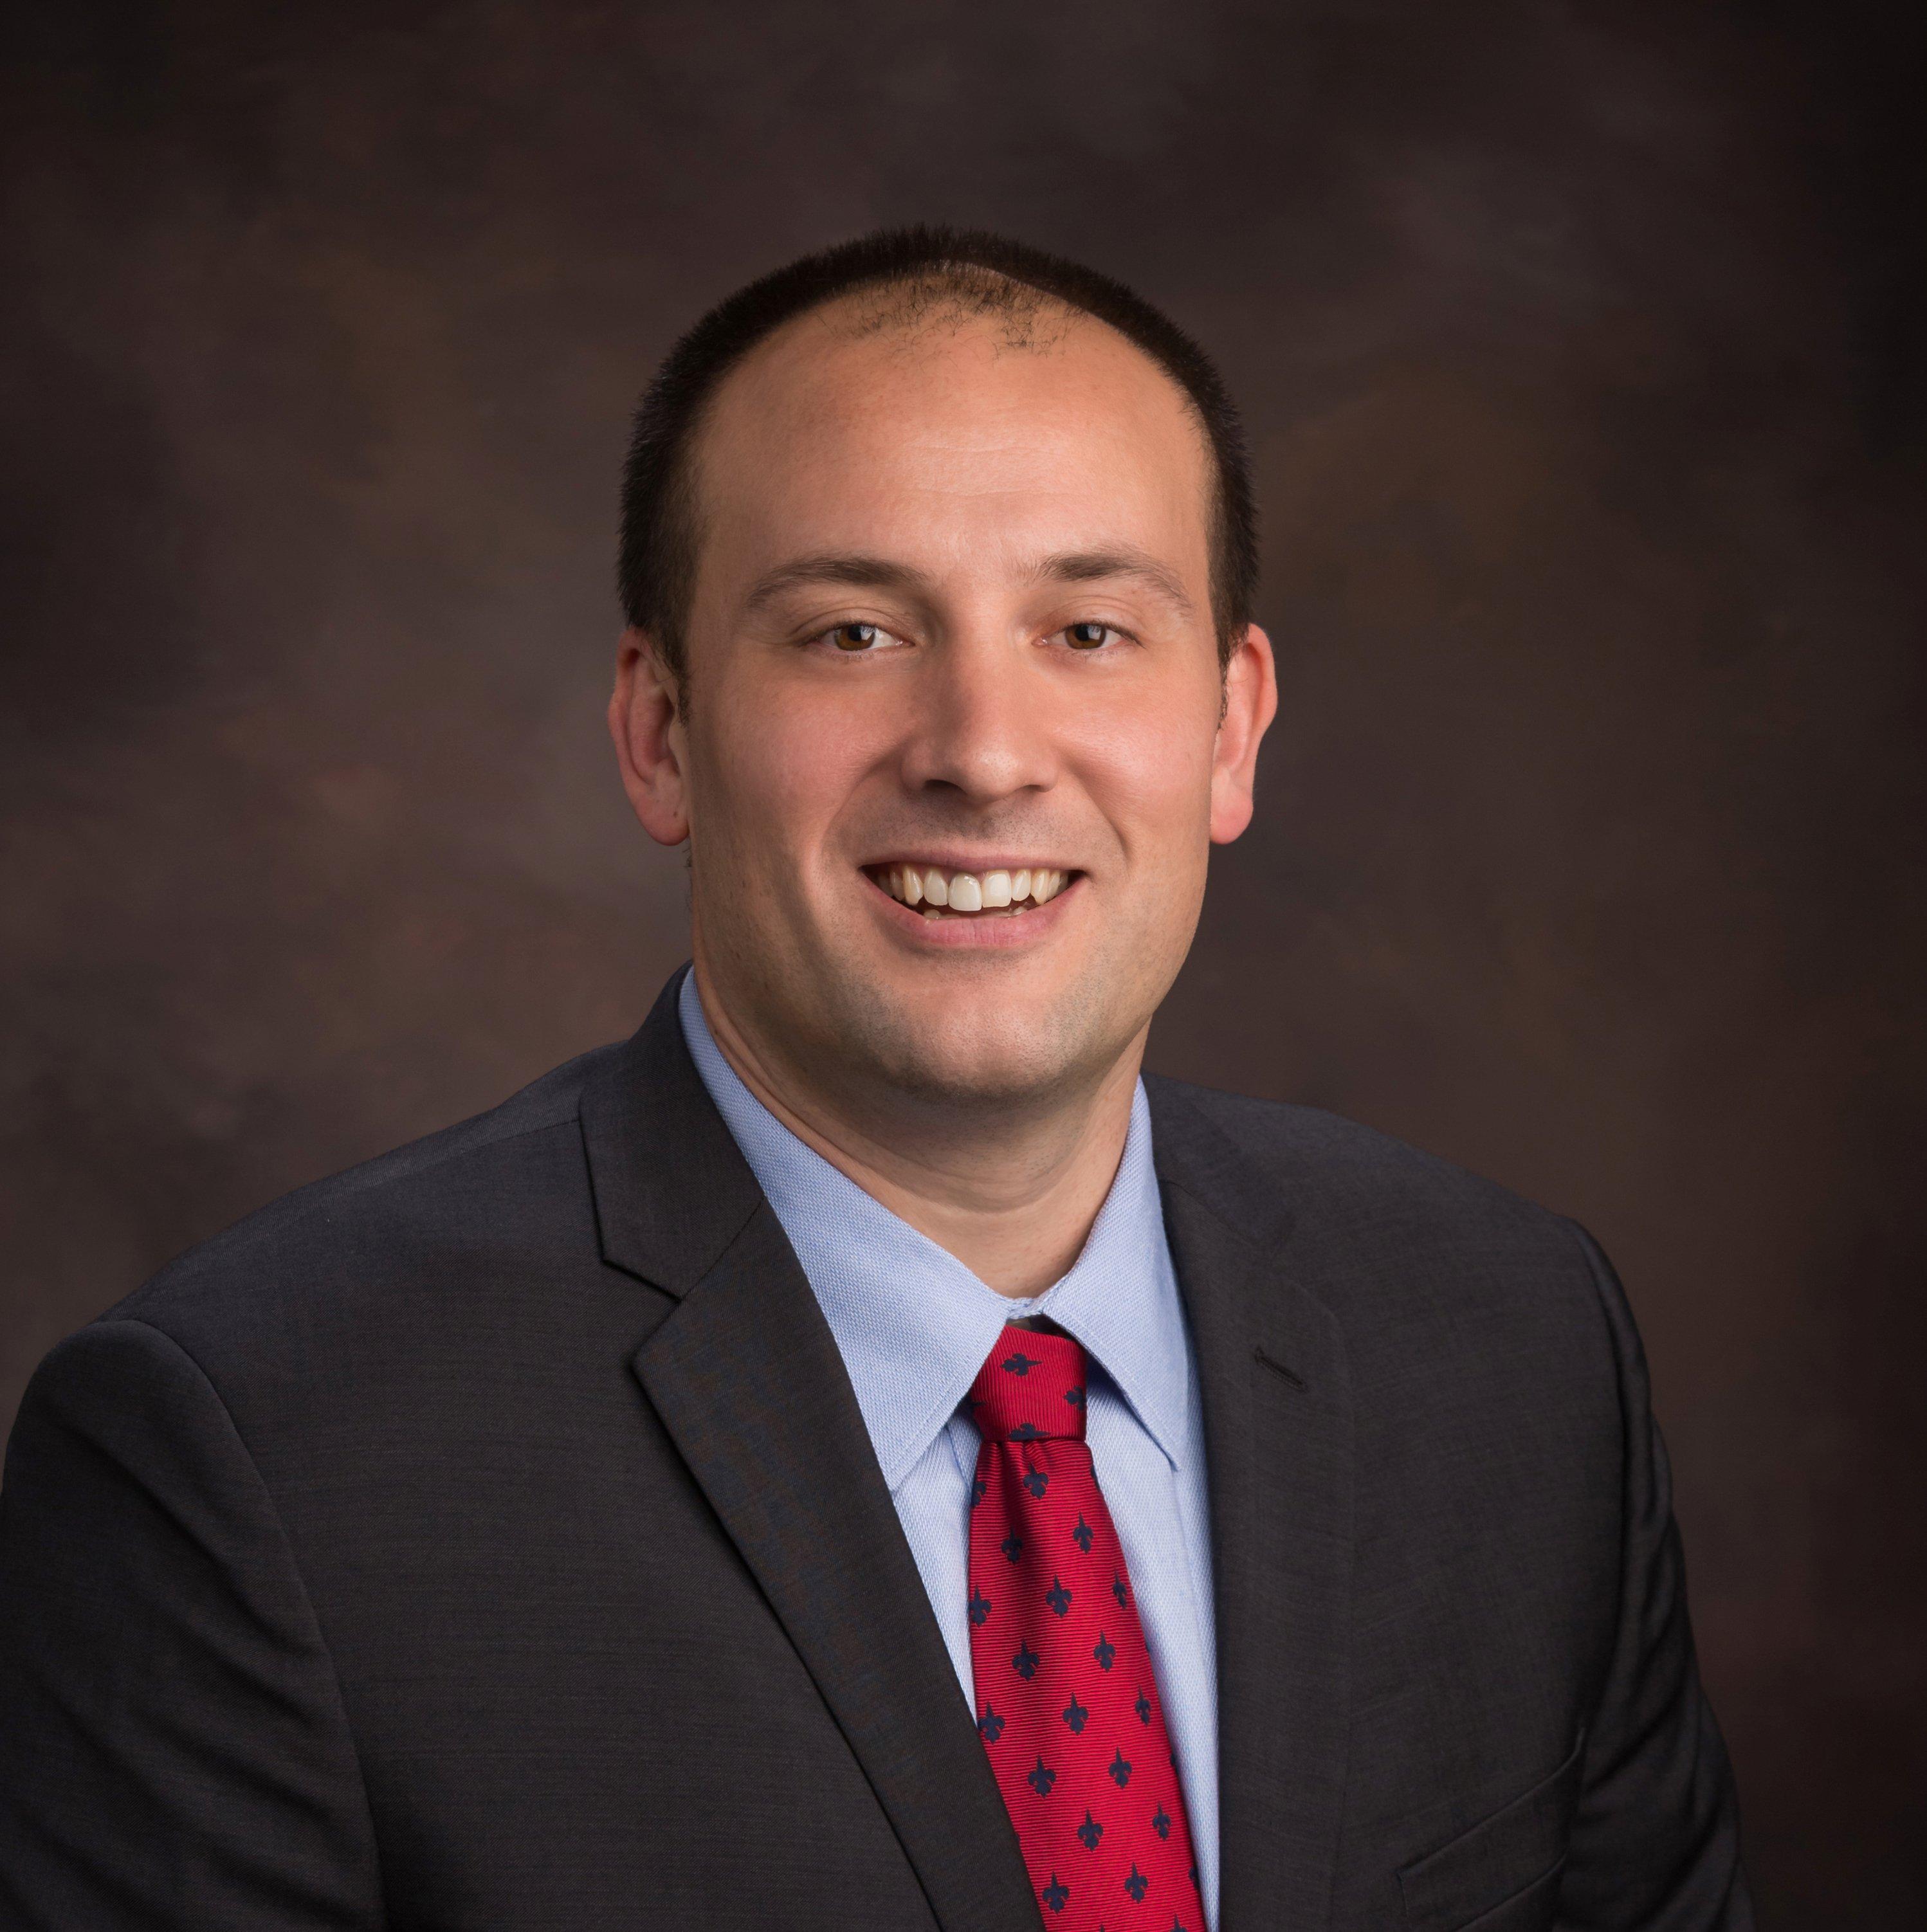 David Homan, MD